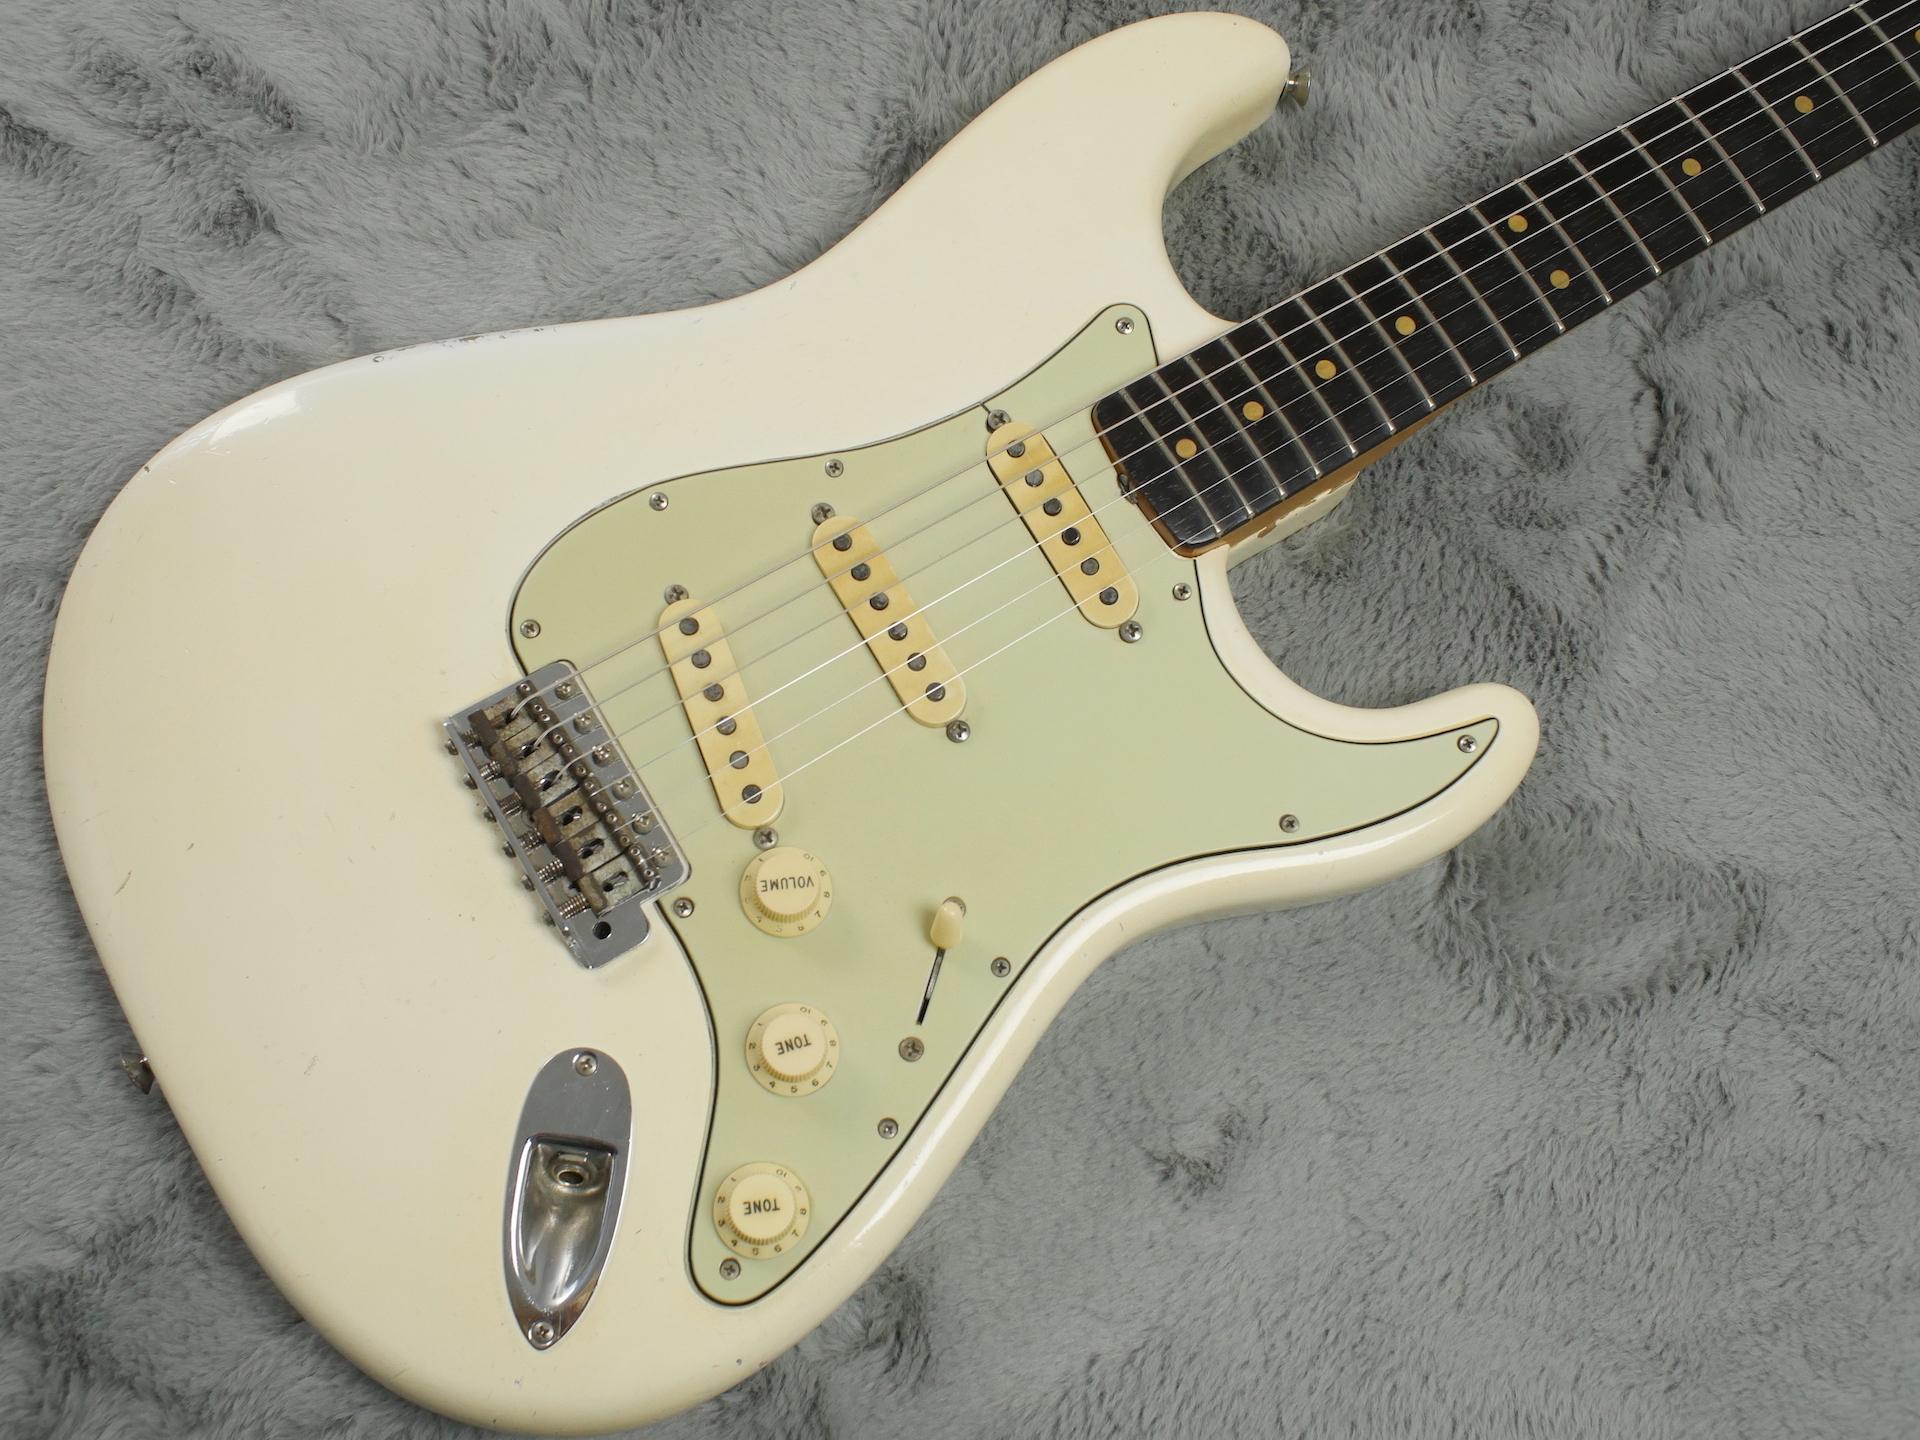 1964 Fender Stratocaster Olympic White body refin + HSC